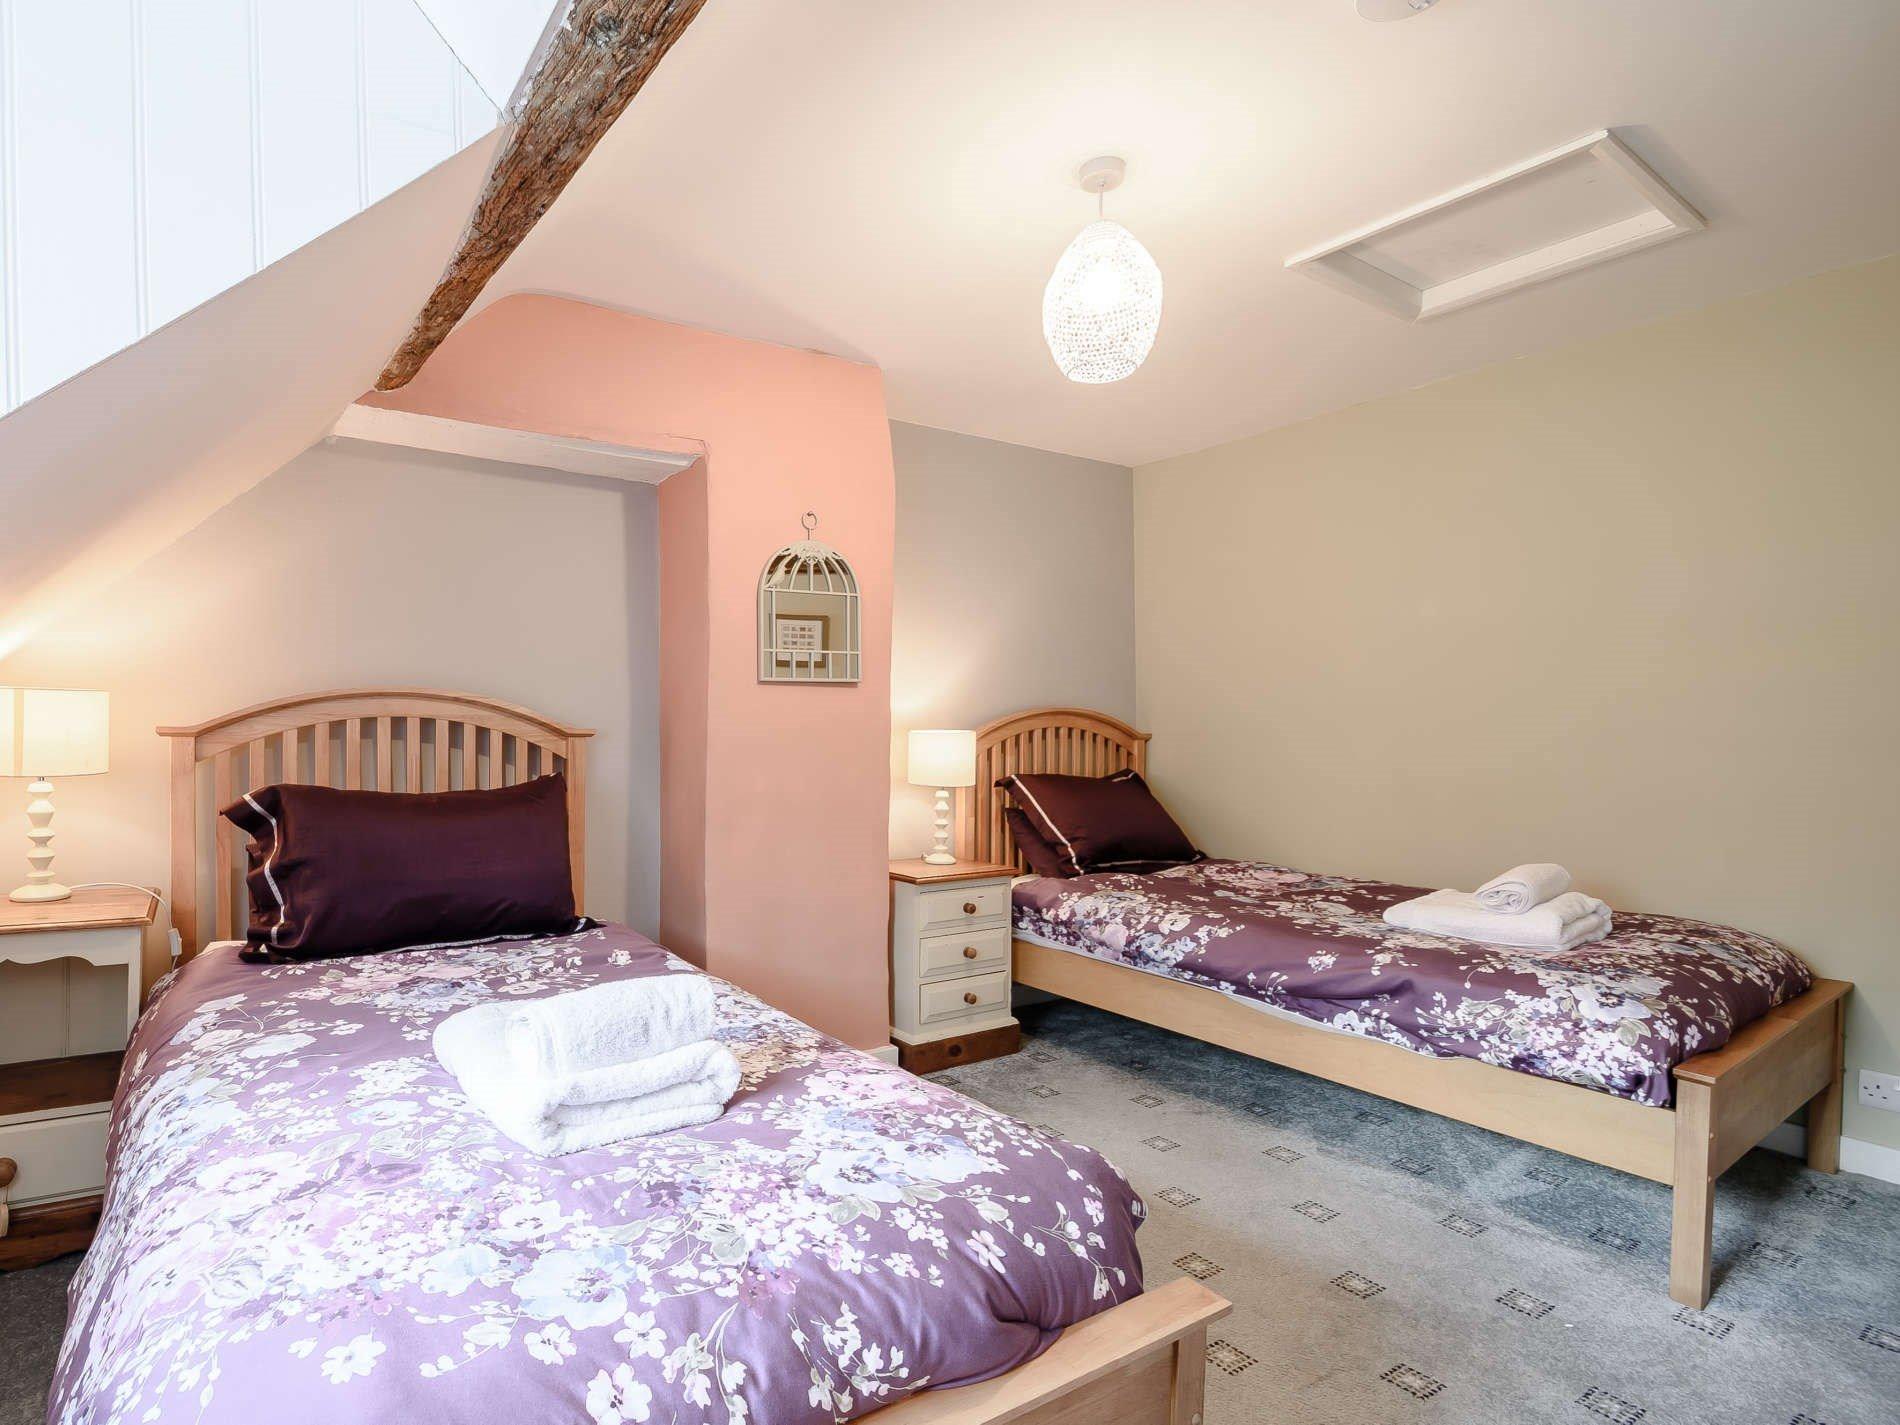 5 Bedroom Cottage in Filey, Yorkshire Dales